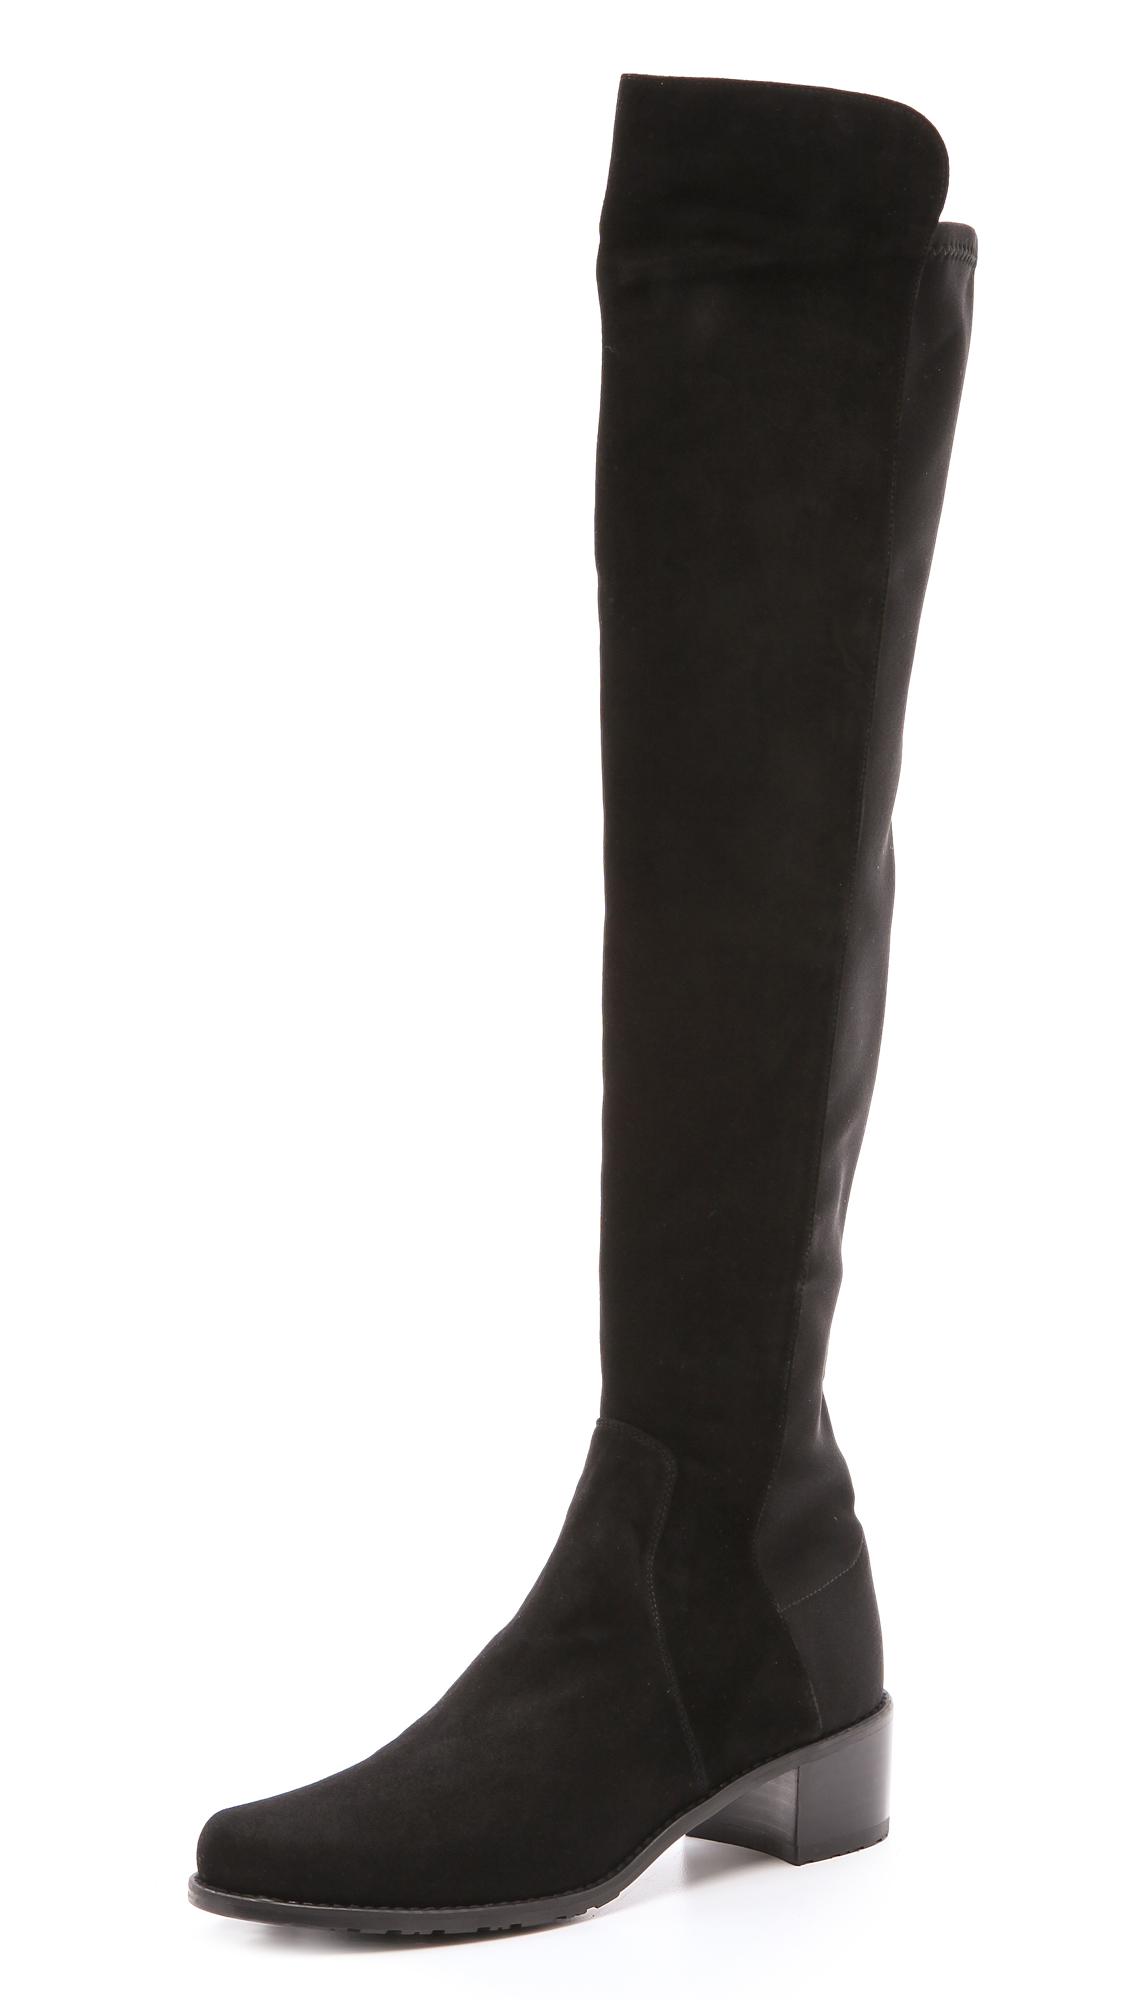 stuart weitzman reserve stretch suede boots shopbop